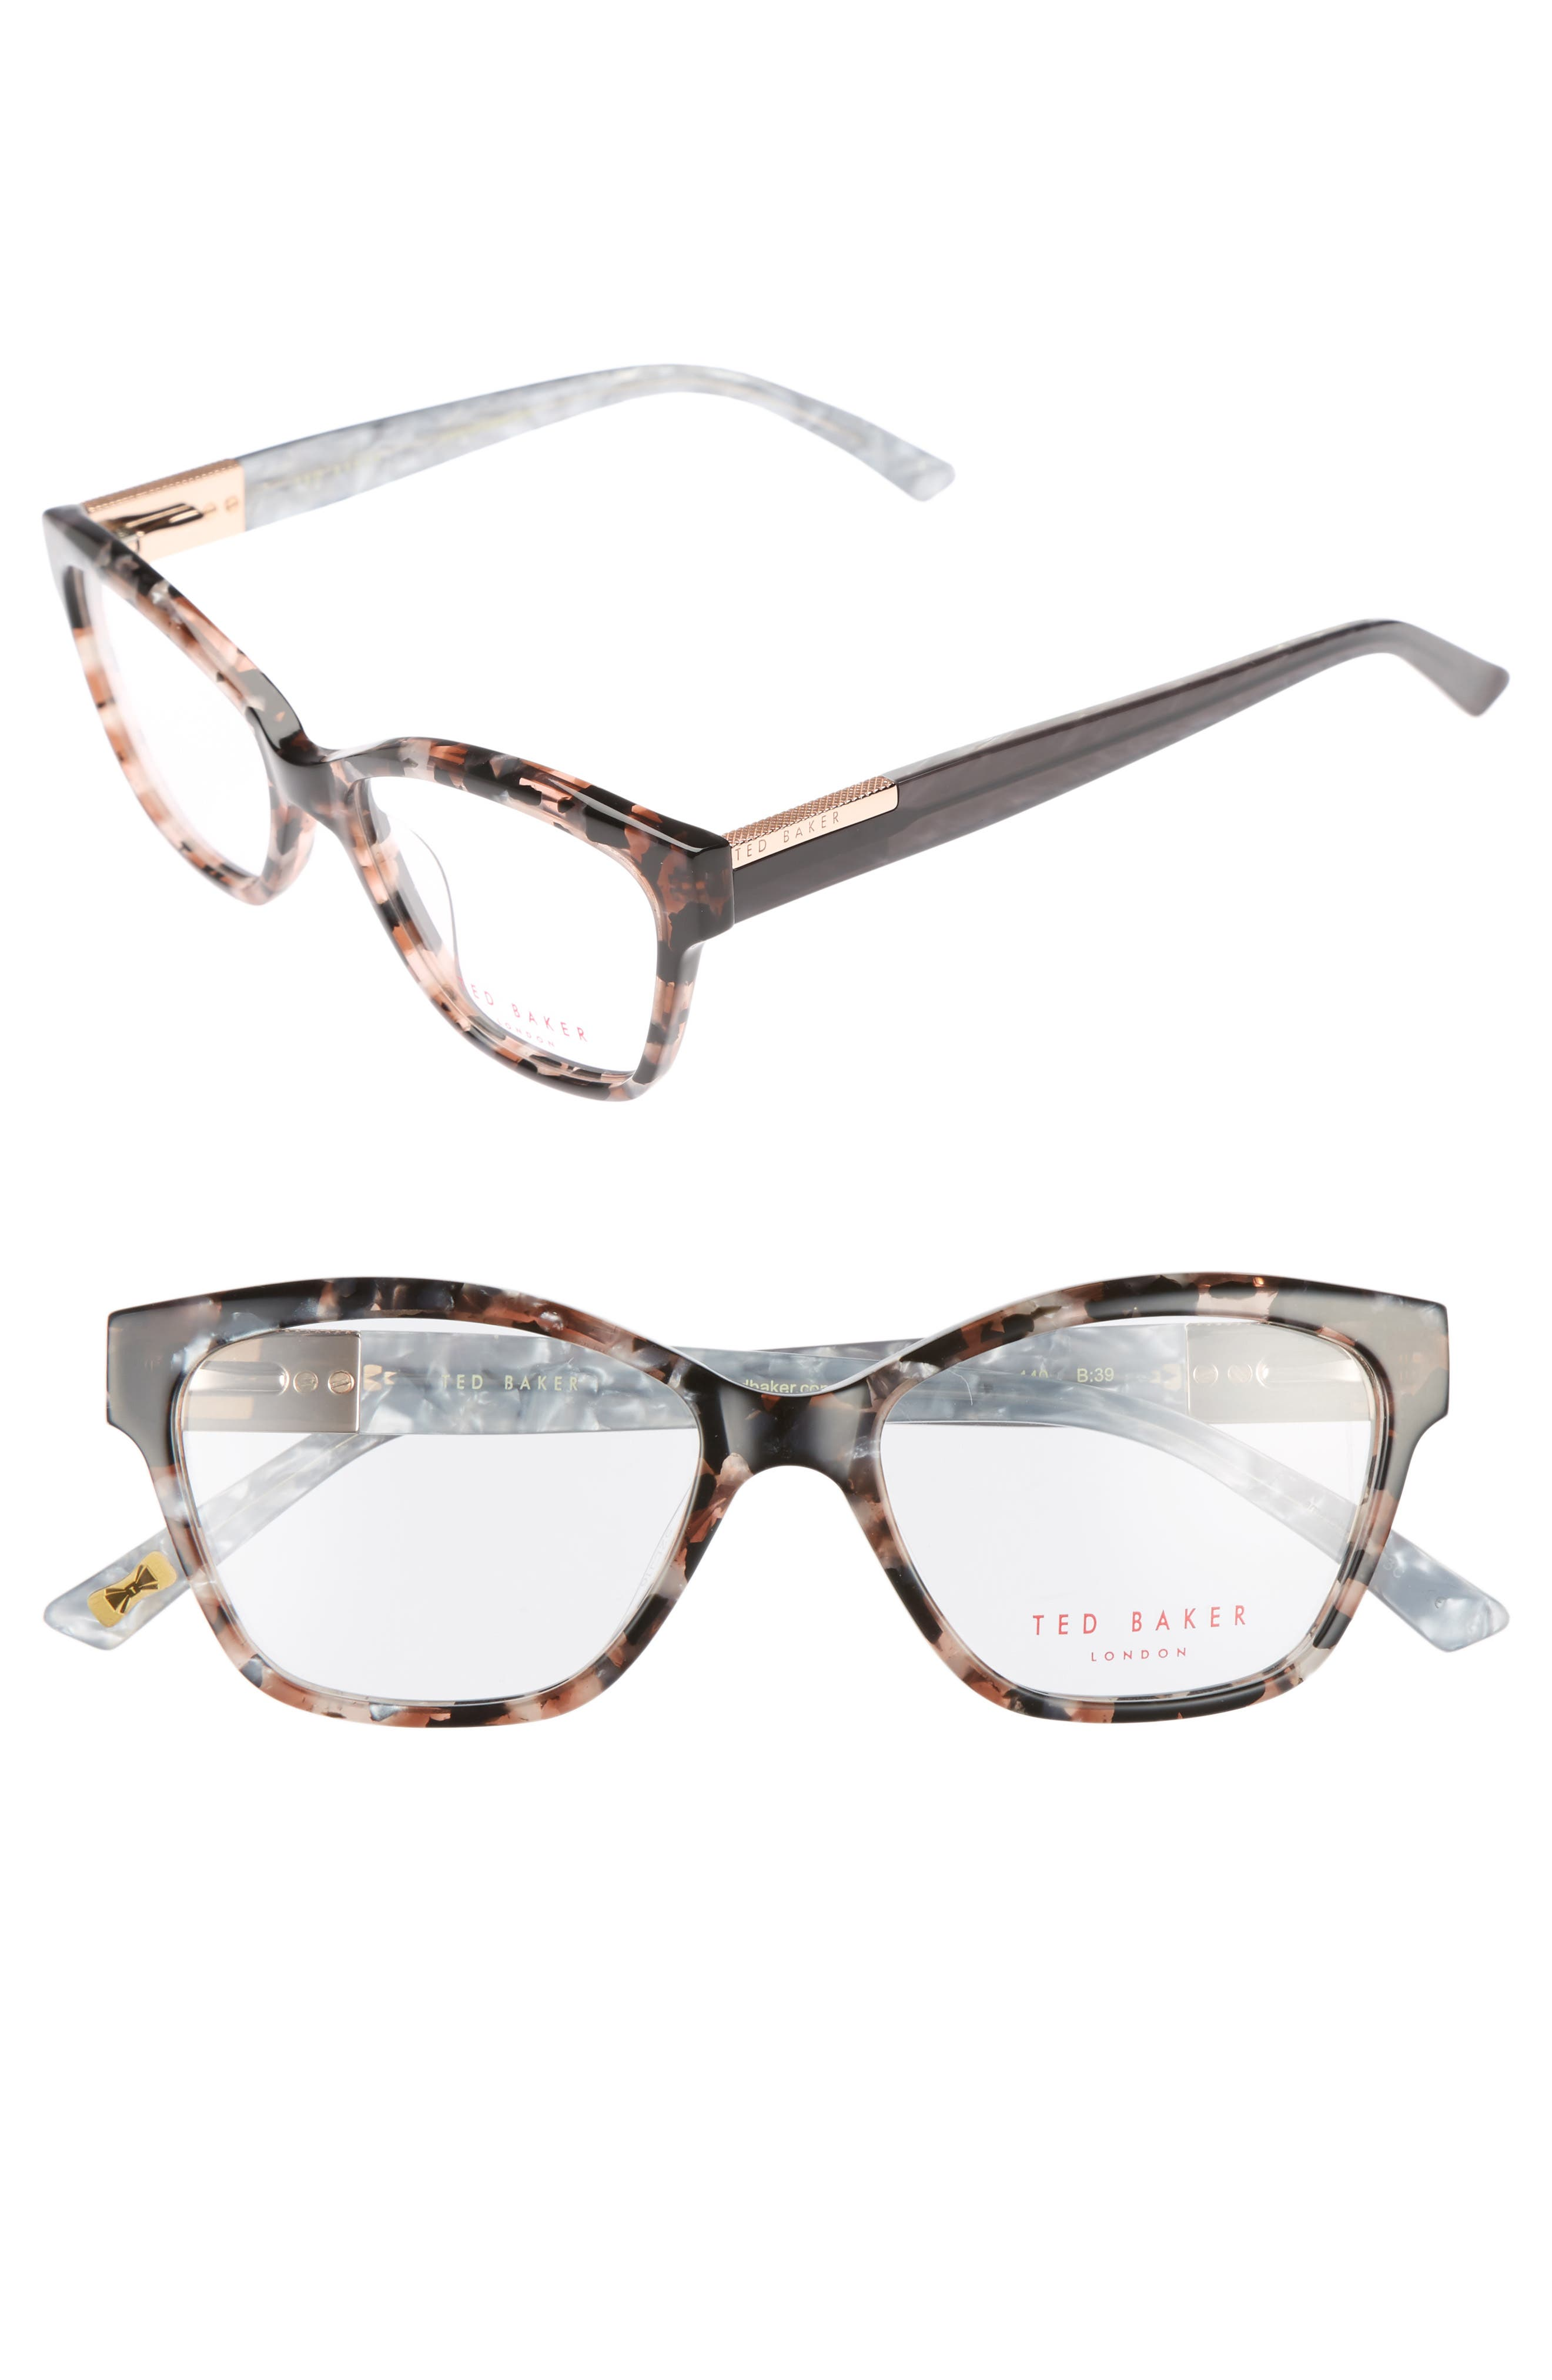 52mm Optical Cat Eye Glasses,                             Main thumbnail 1, color,                             650